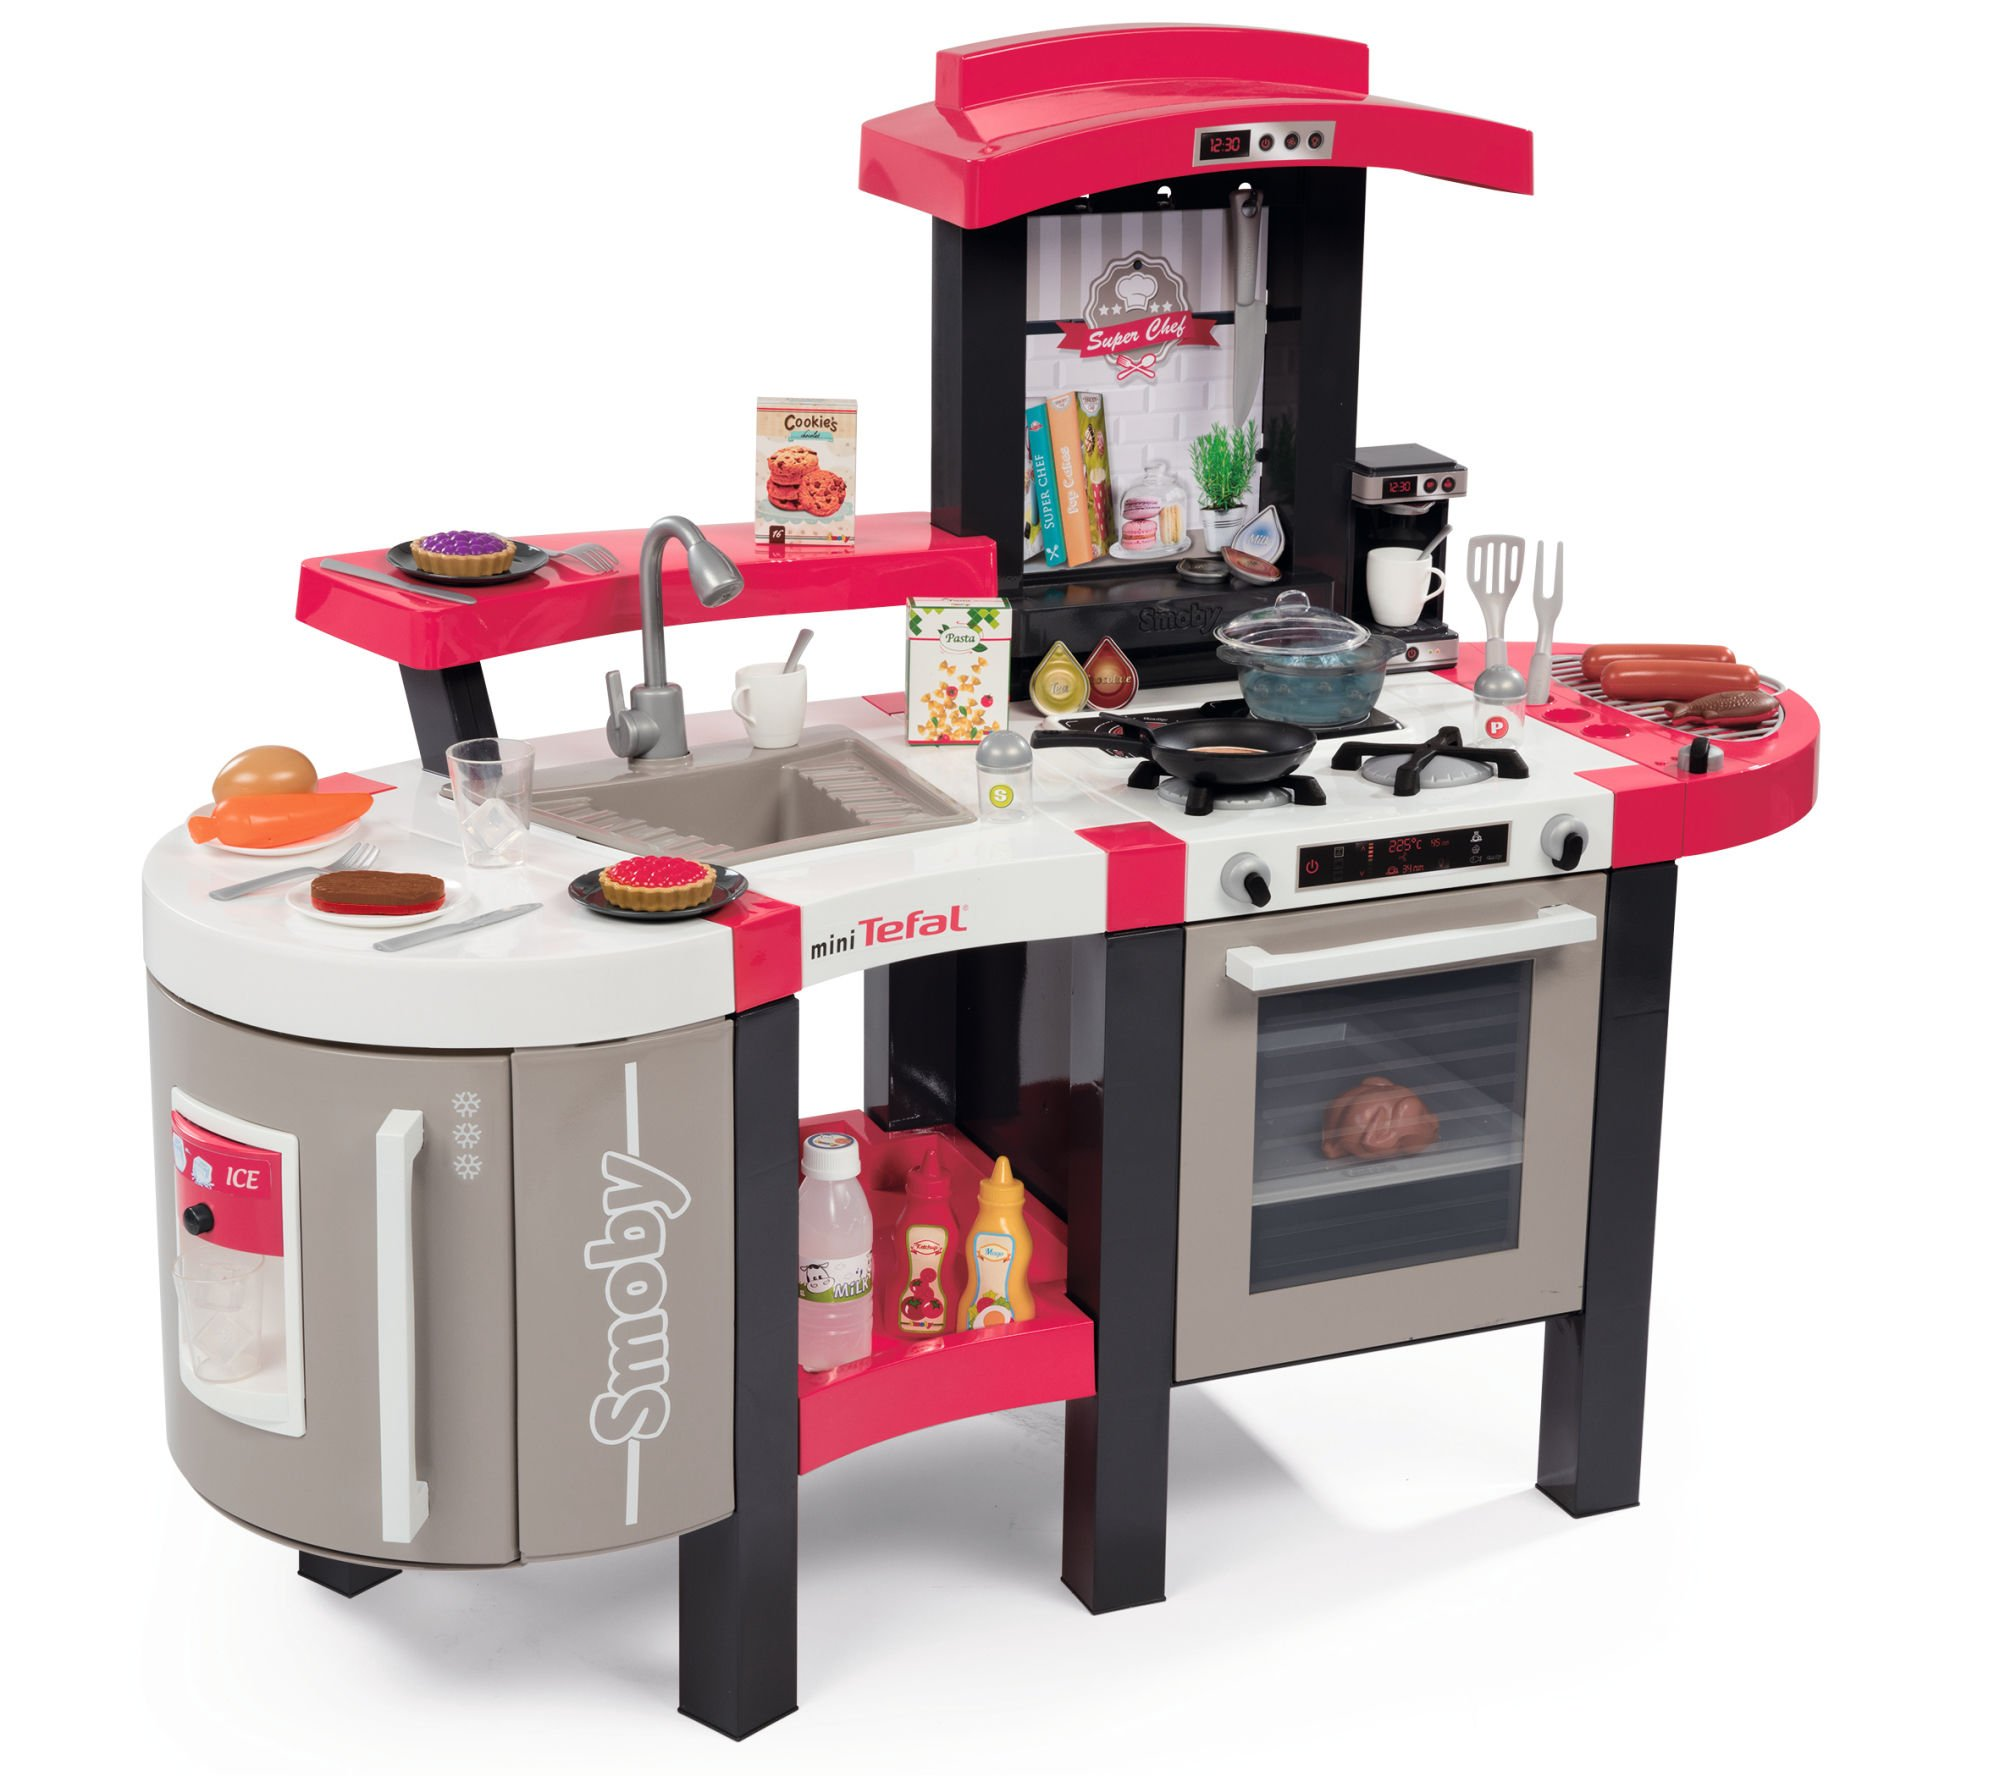 Smoby Kuchnia elektroniczna mini Tefal Superchef De Luxe